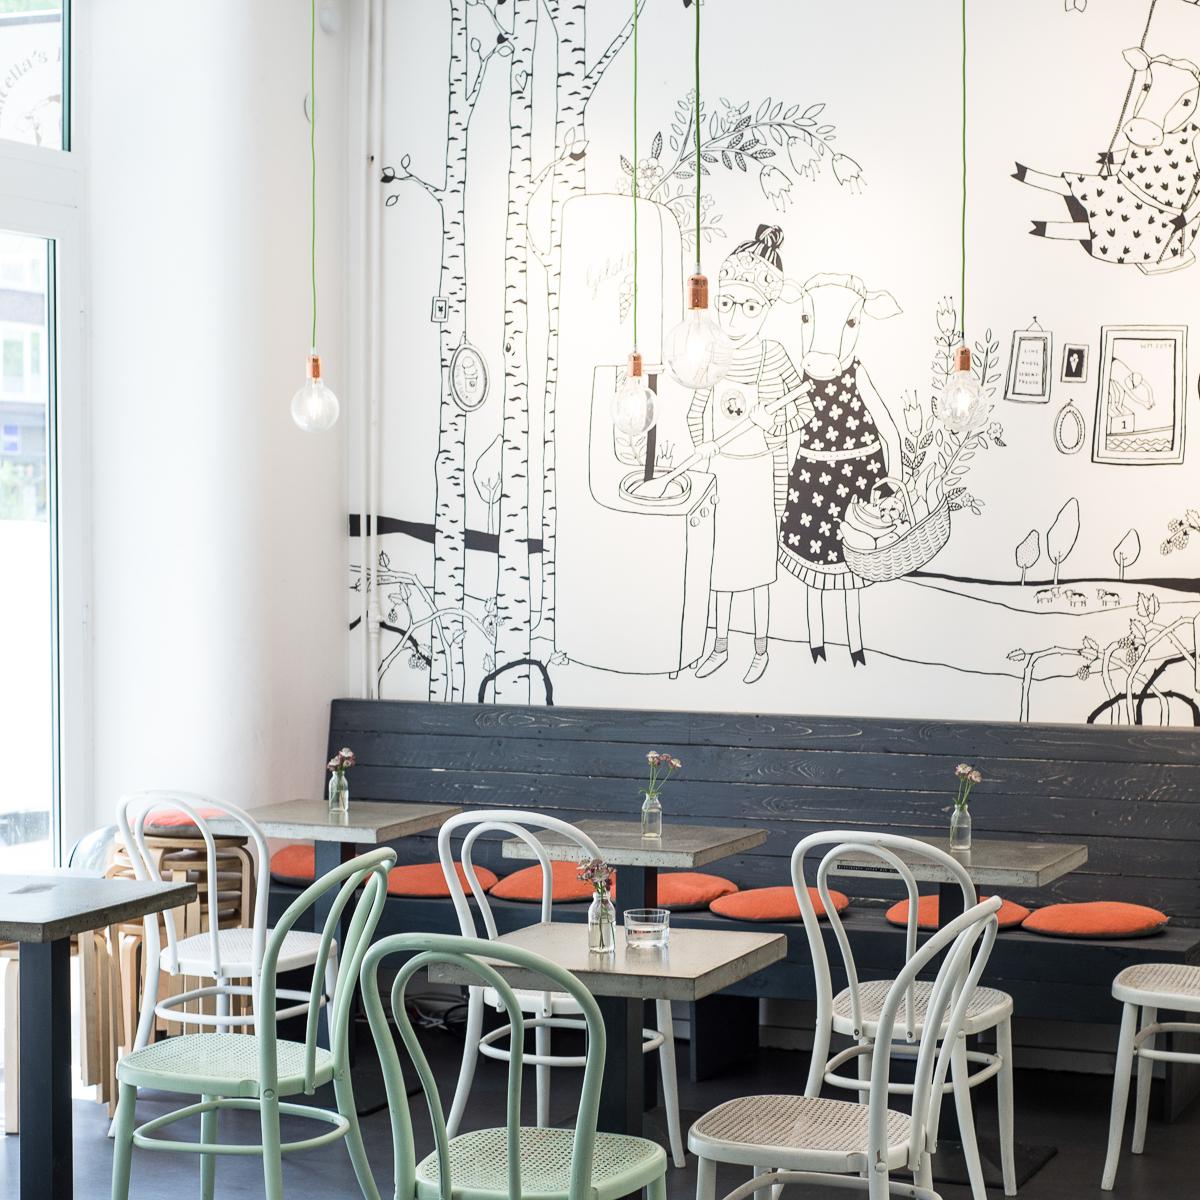 Eisdiele Café Luicella´s Hamburg St. Georg-2